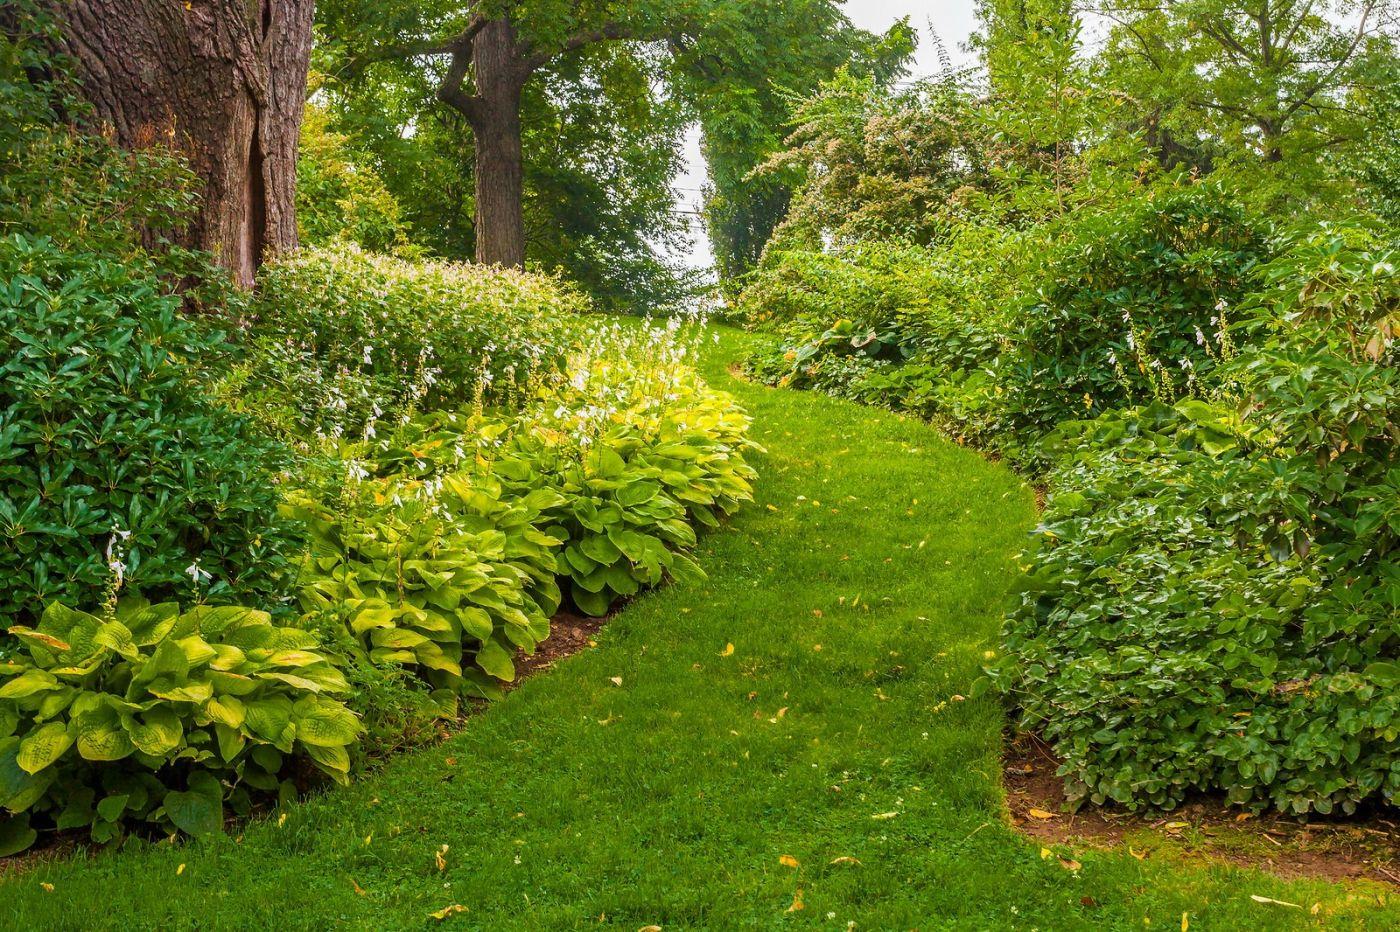 Chanticleer花园,融入自然_图1-30